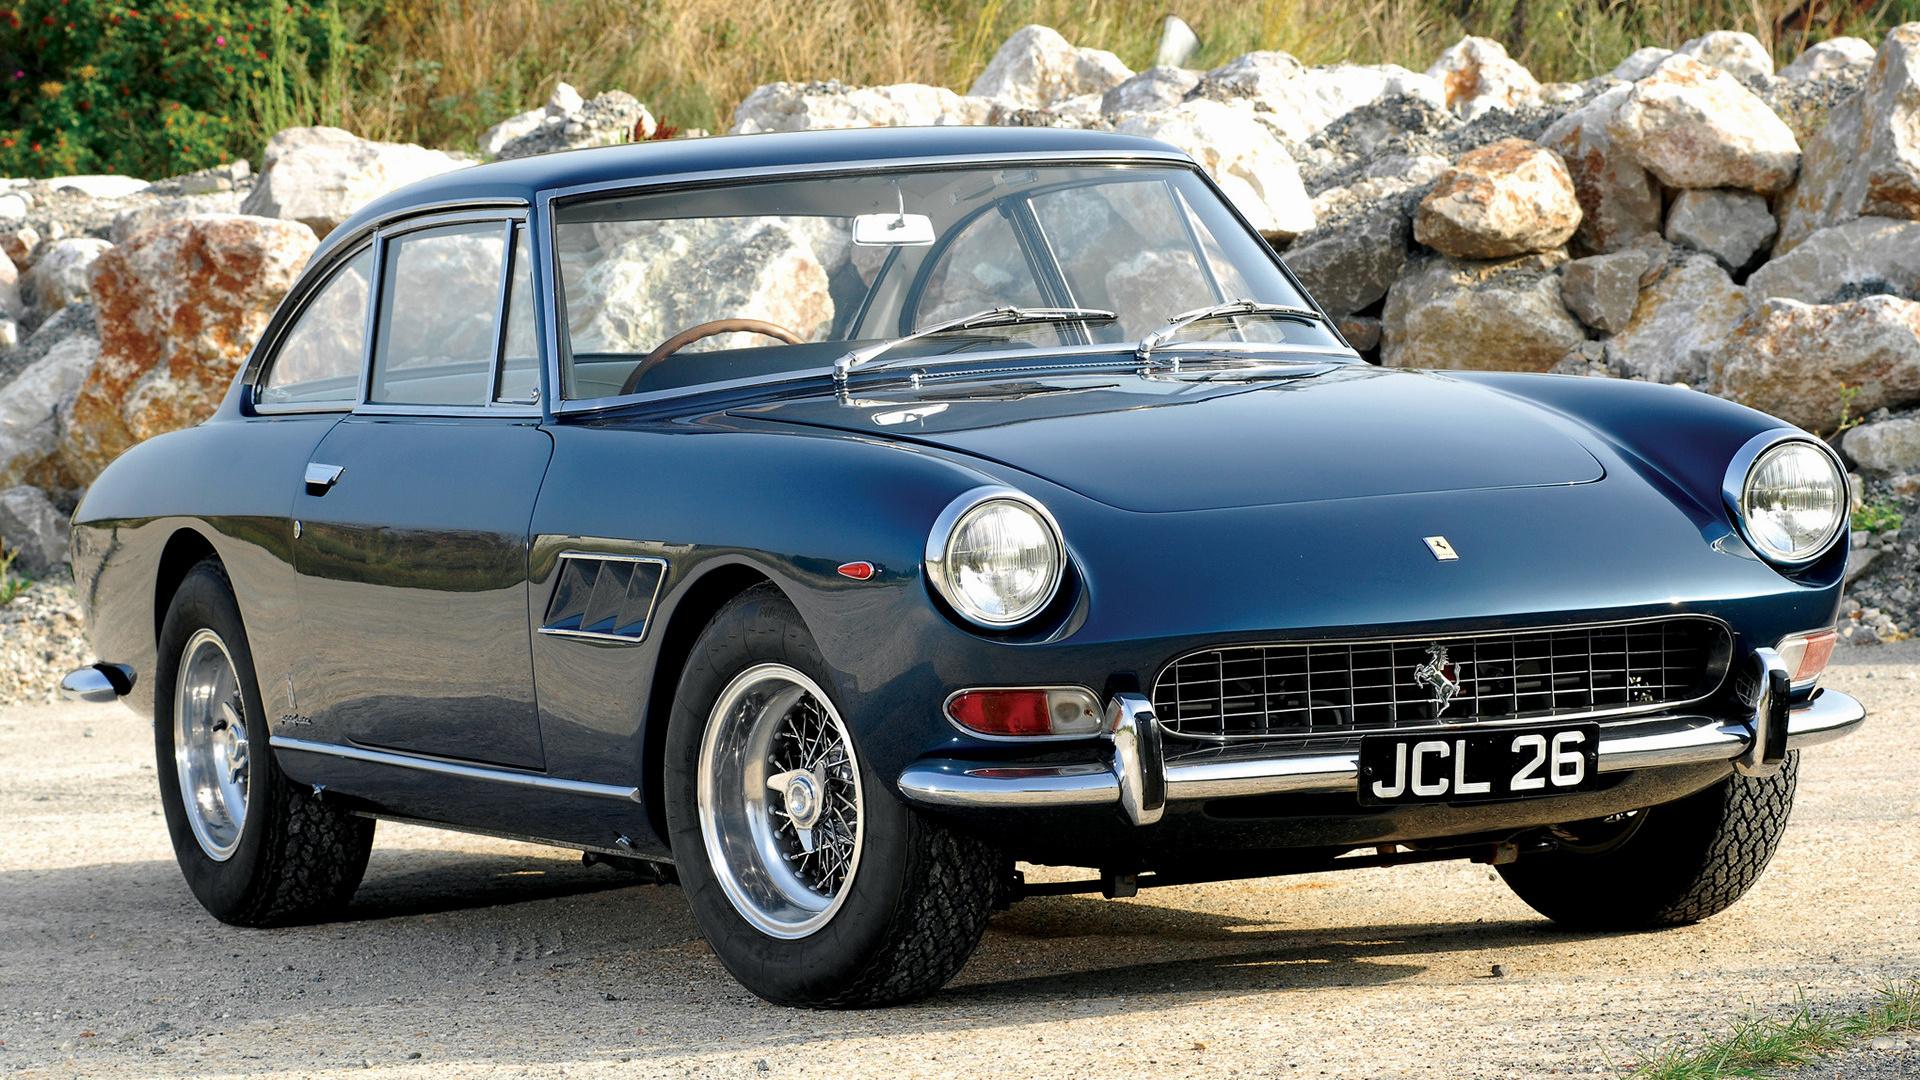 1965 Ferrari 330 Gt 2 2 Uk Hintergrundbilder Und Wallpaper In Hd Car Pixel